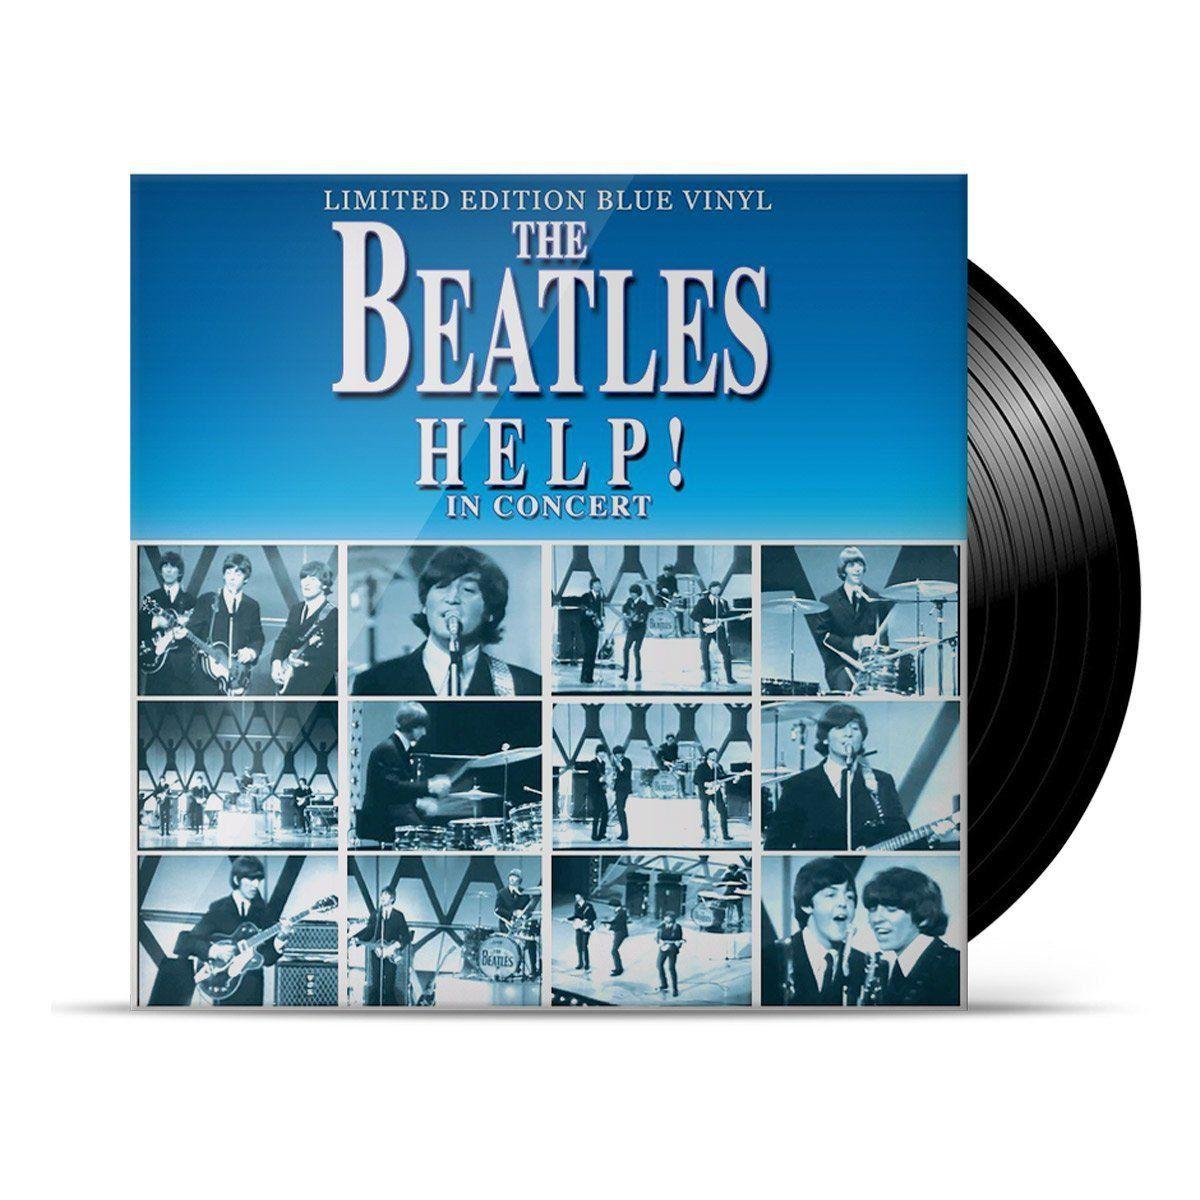 LP The Beatles Help In Concert  - bandUP Store Marketplace